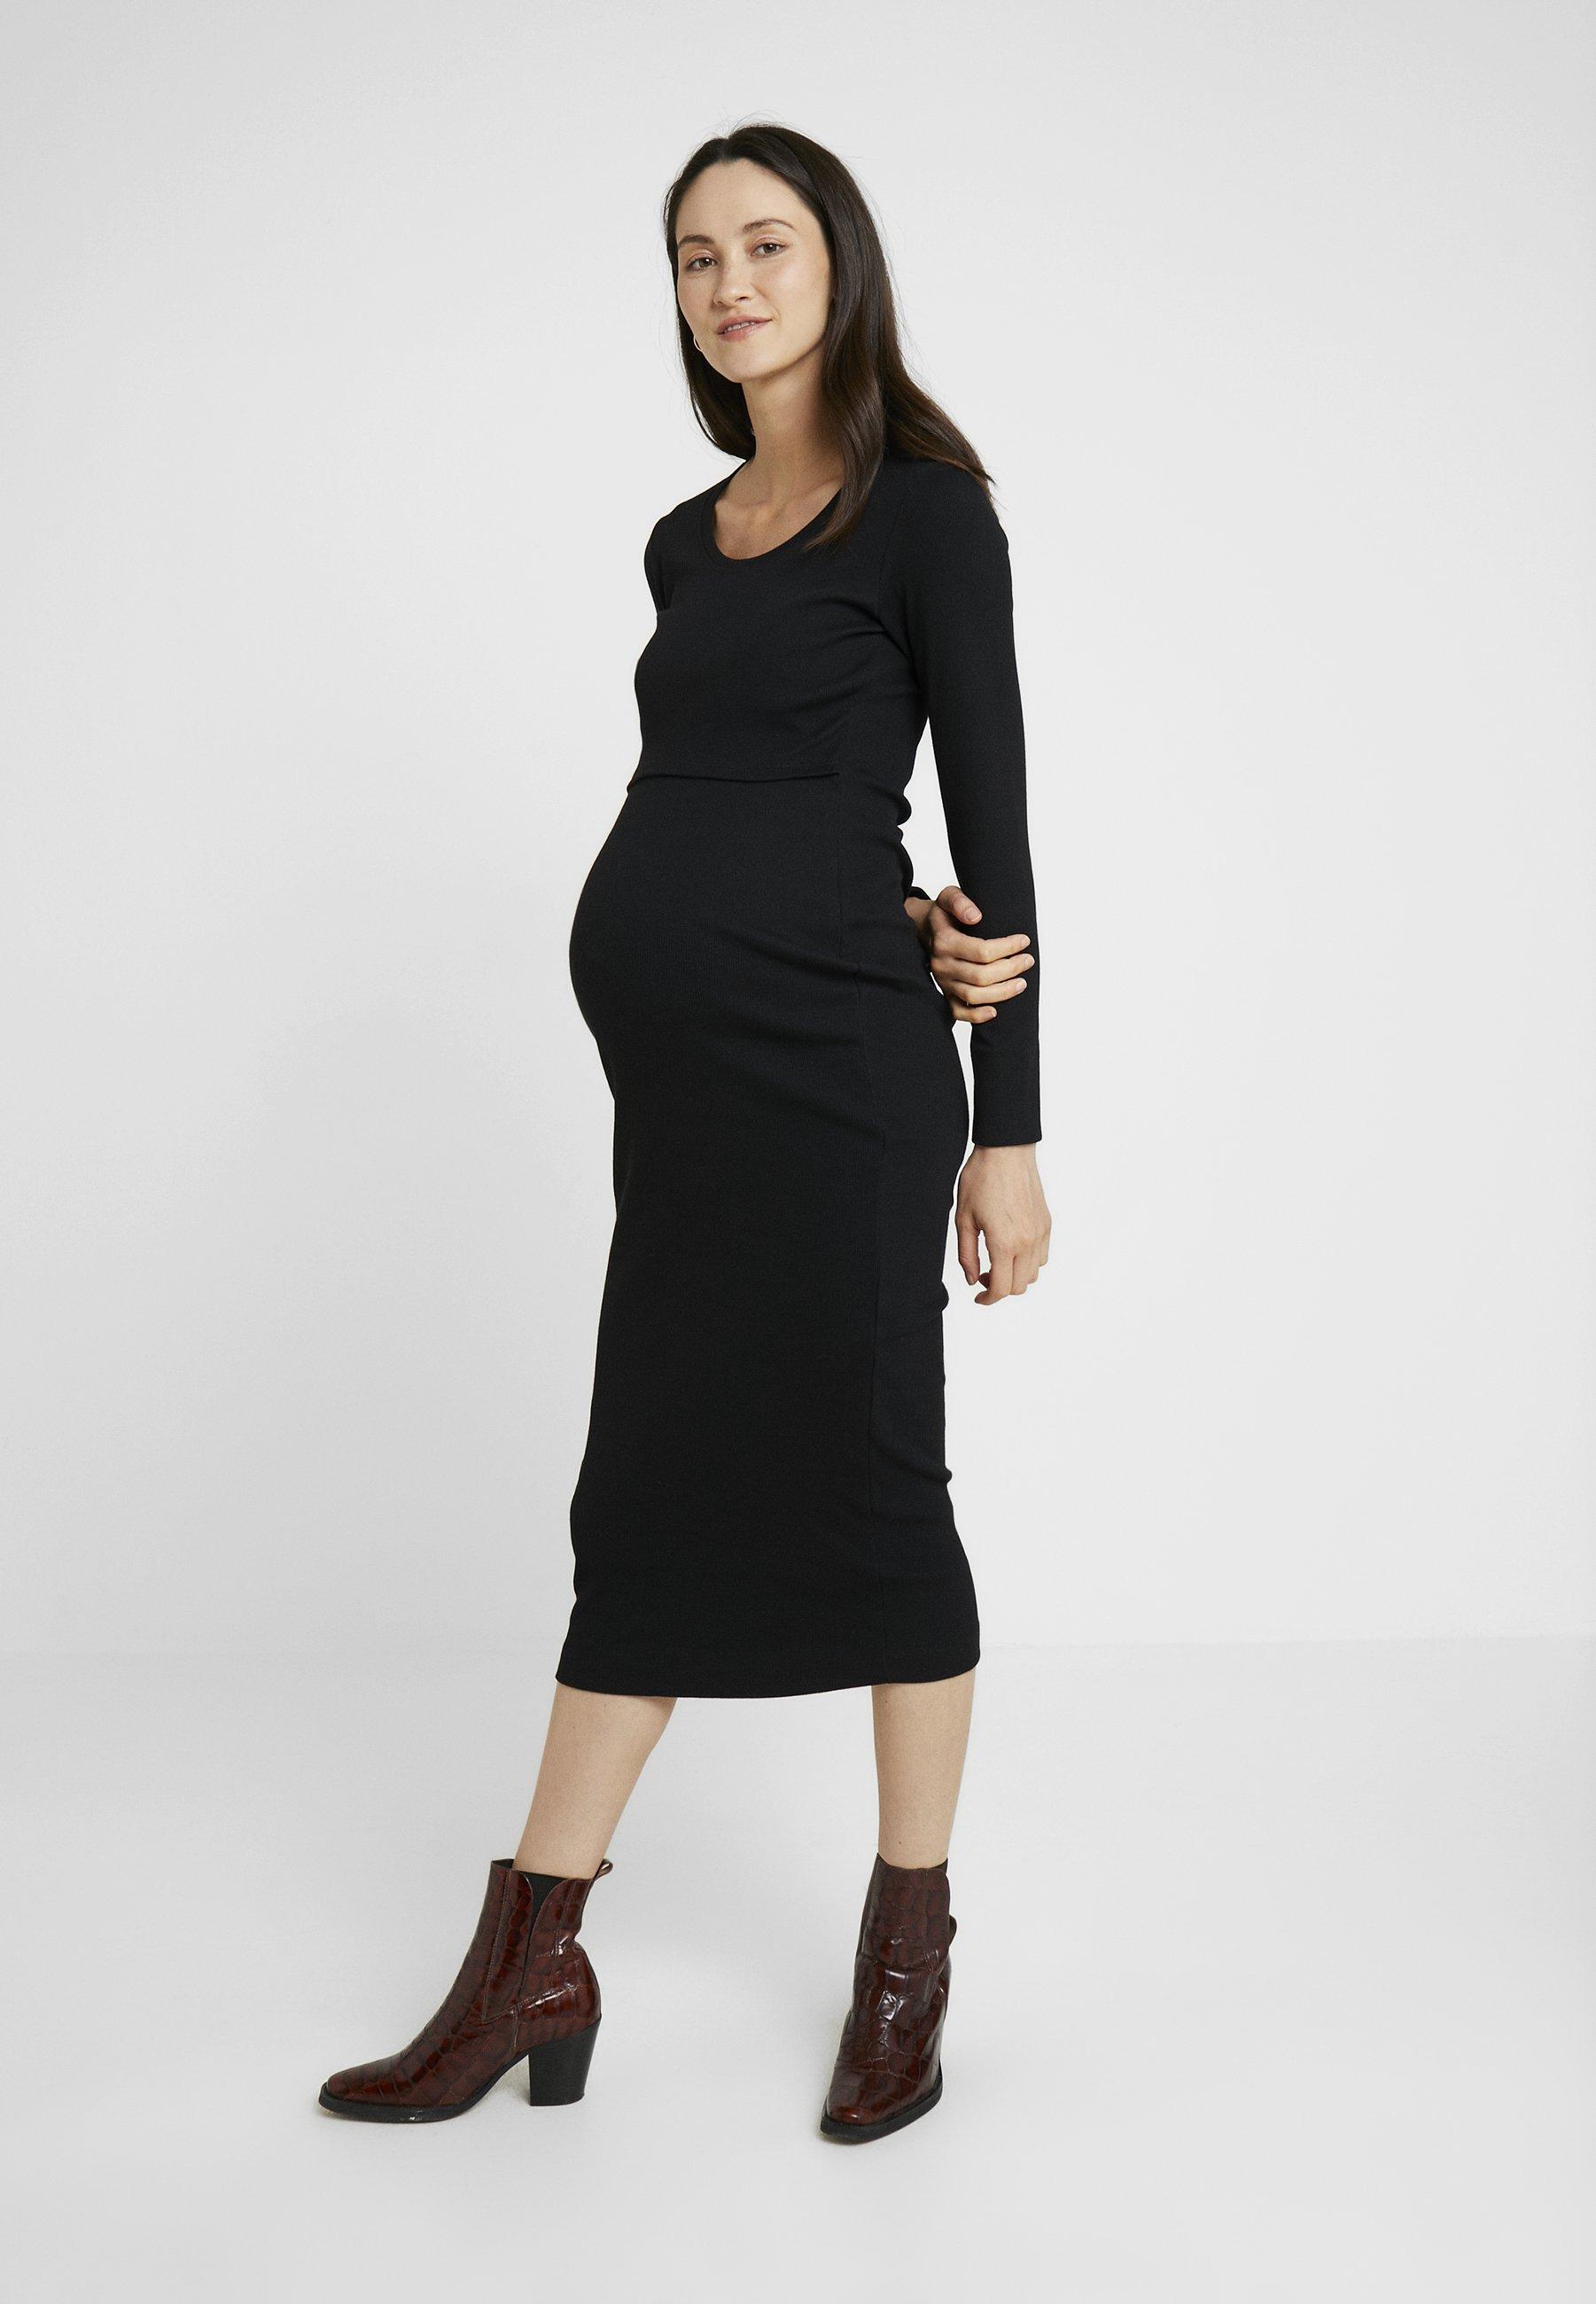 Recommend Cheap Women's Clothing Boob SIGNE DRESS Maxi dress black BQCaupEmP